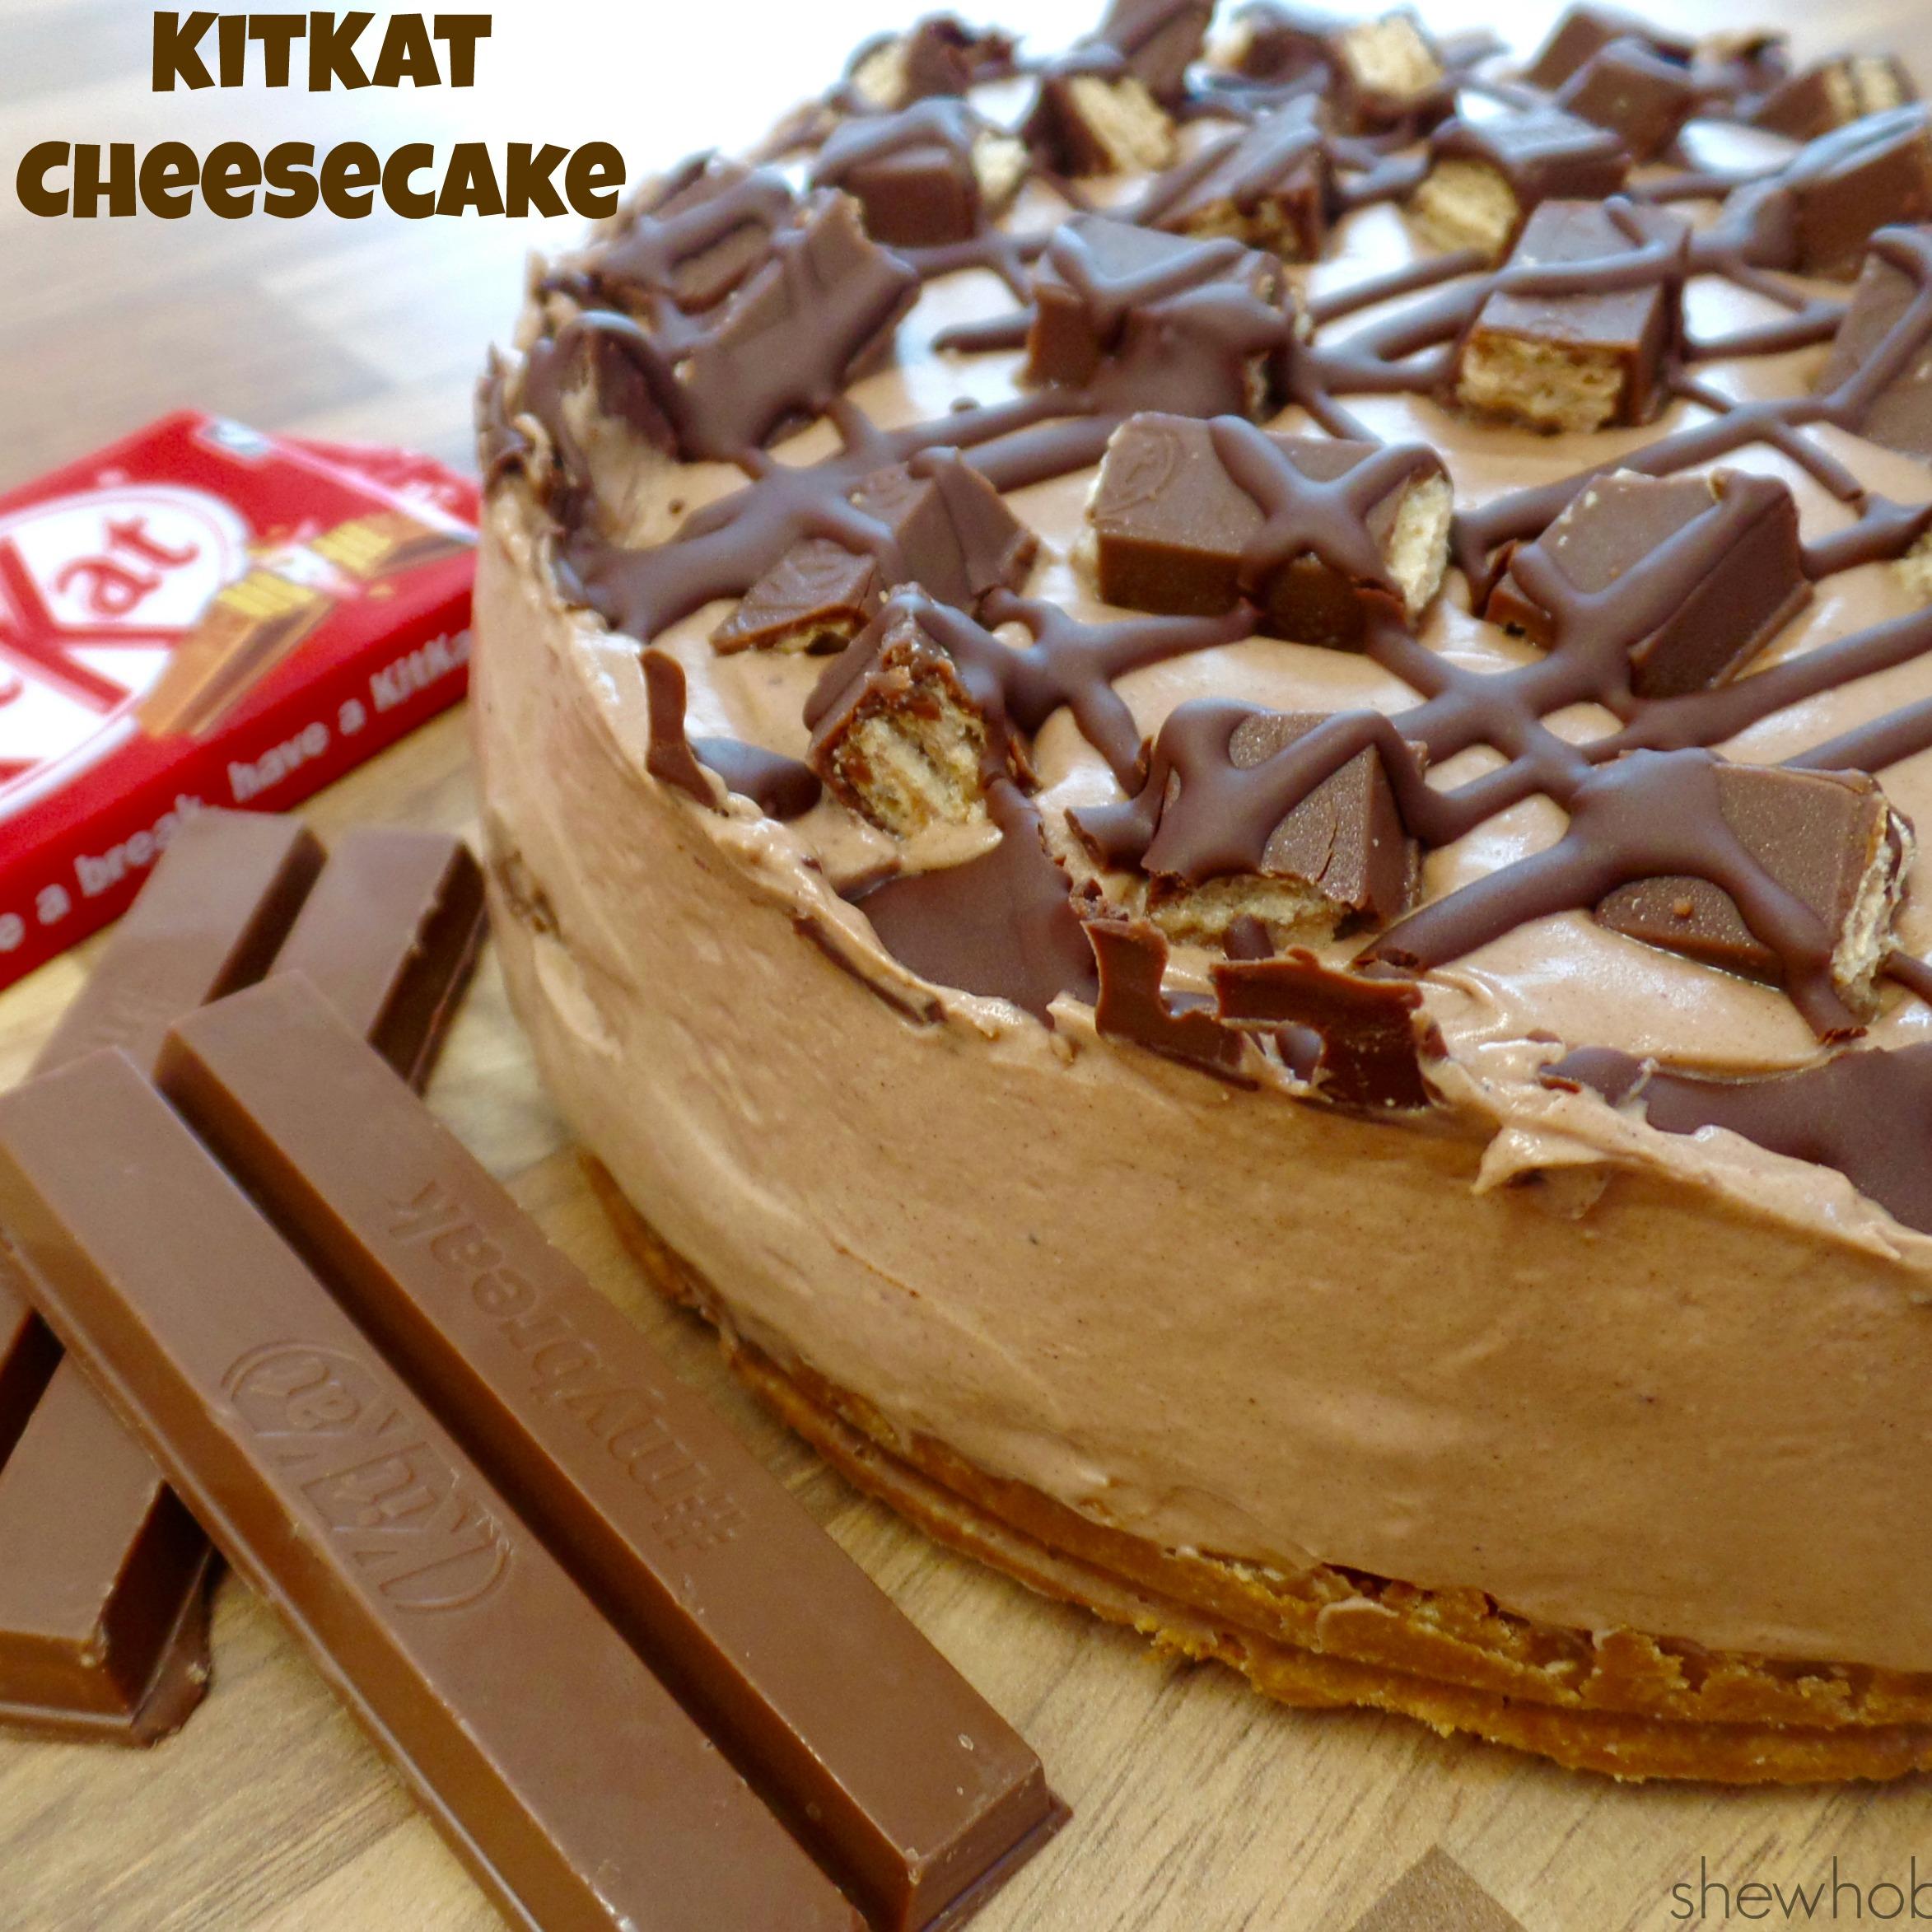 Kitkat Cheesecake She Who Bakes